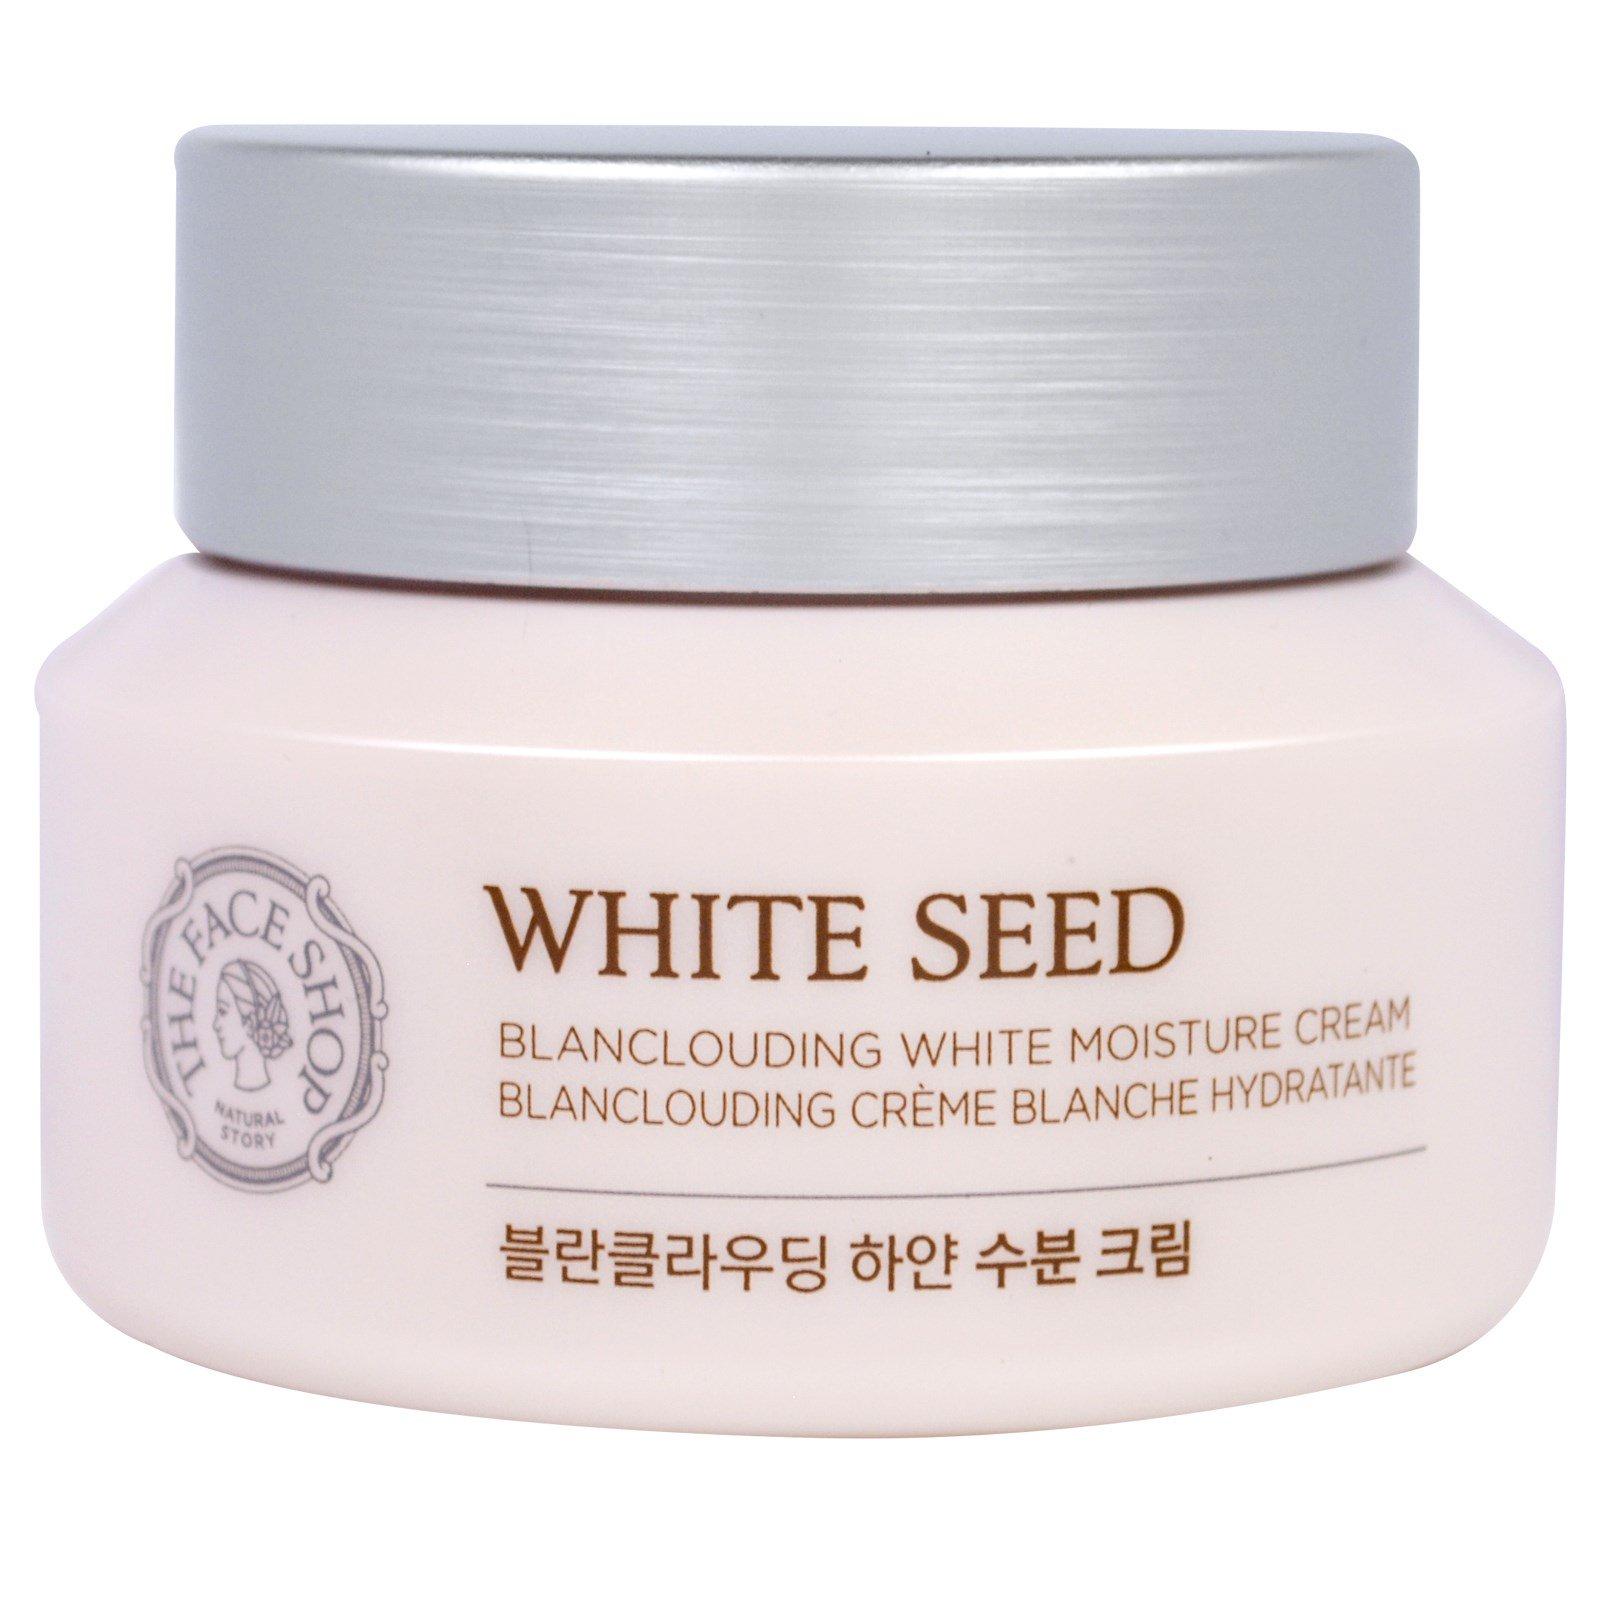 The Face Shop, Увлажняющий крем White Seed, Blanclouding White, 1,69 жидк. унций (50 мл)